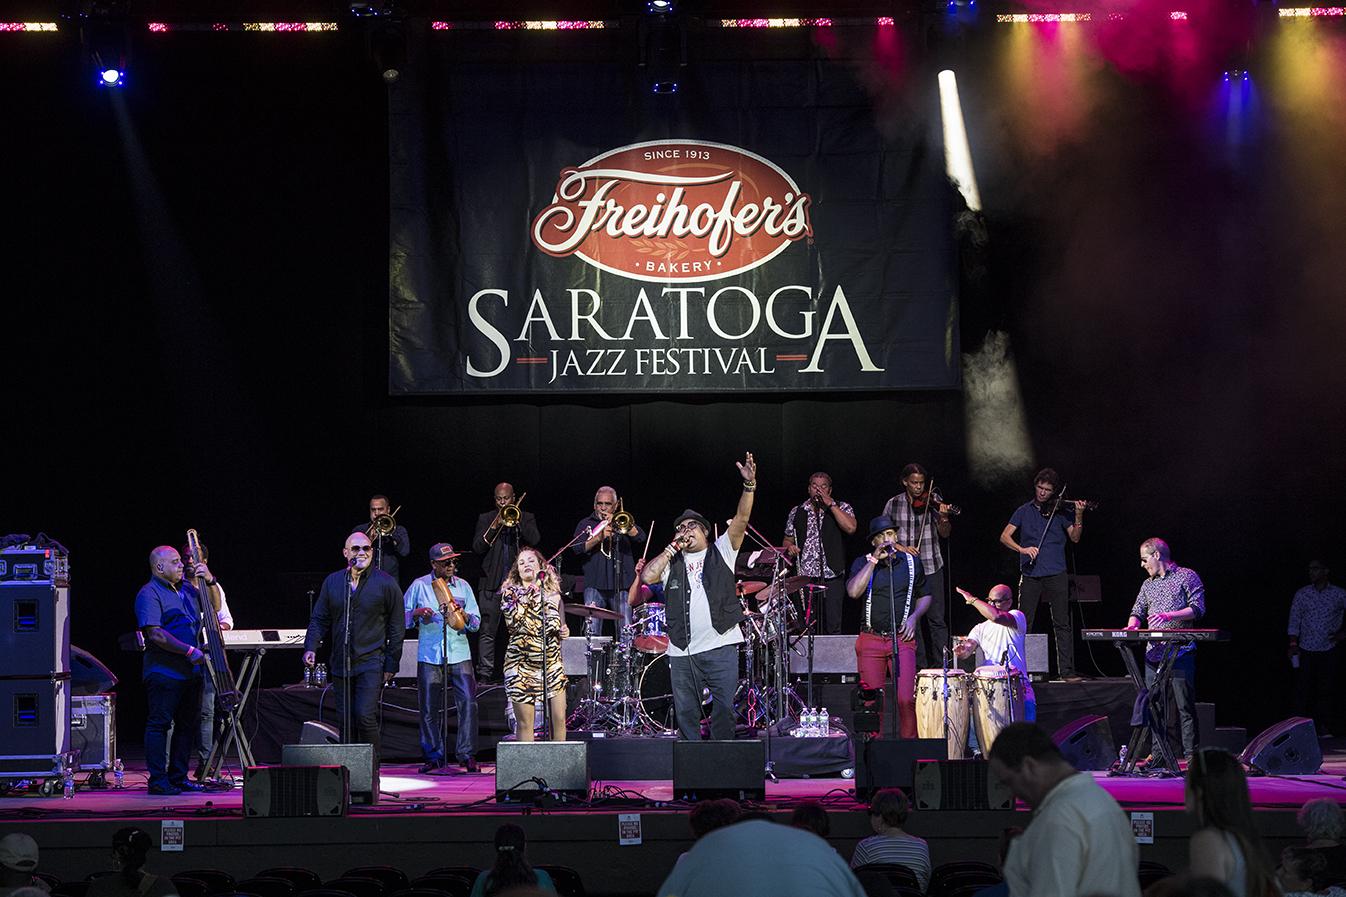 Los Van Van at the 2019 Saratoga Jazz Festival